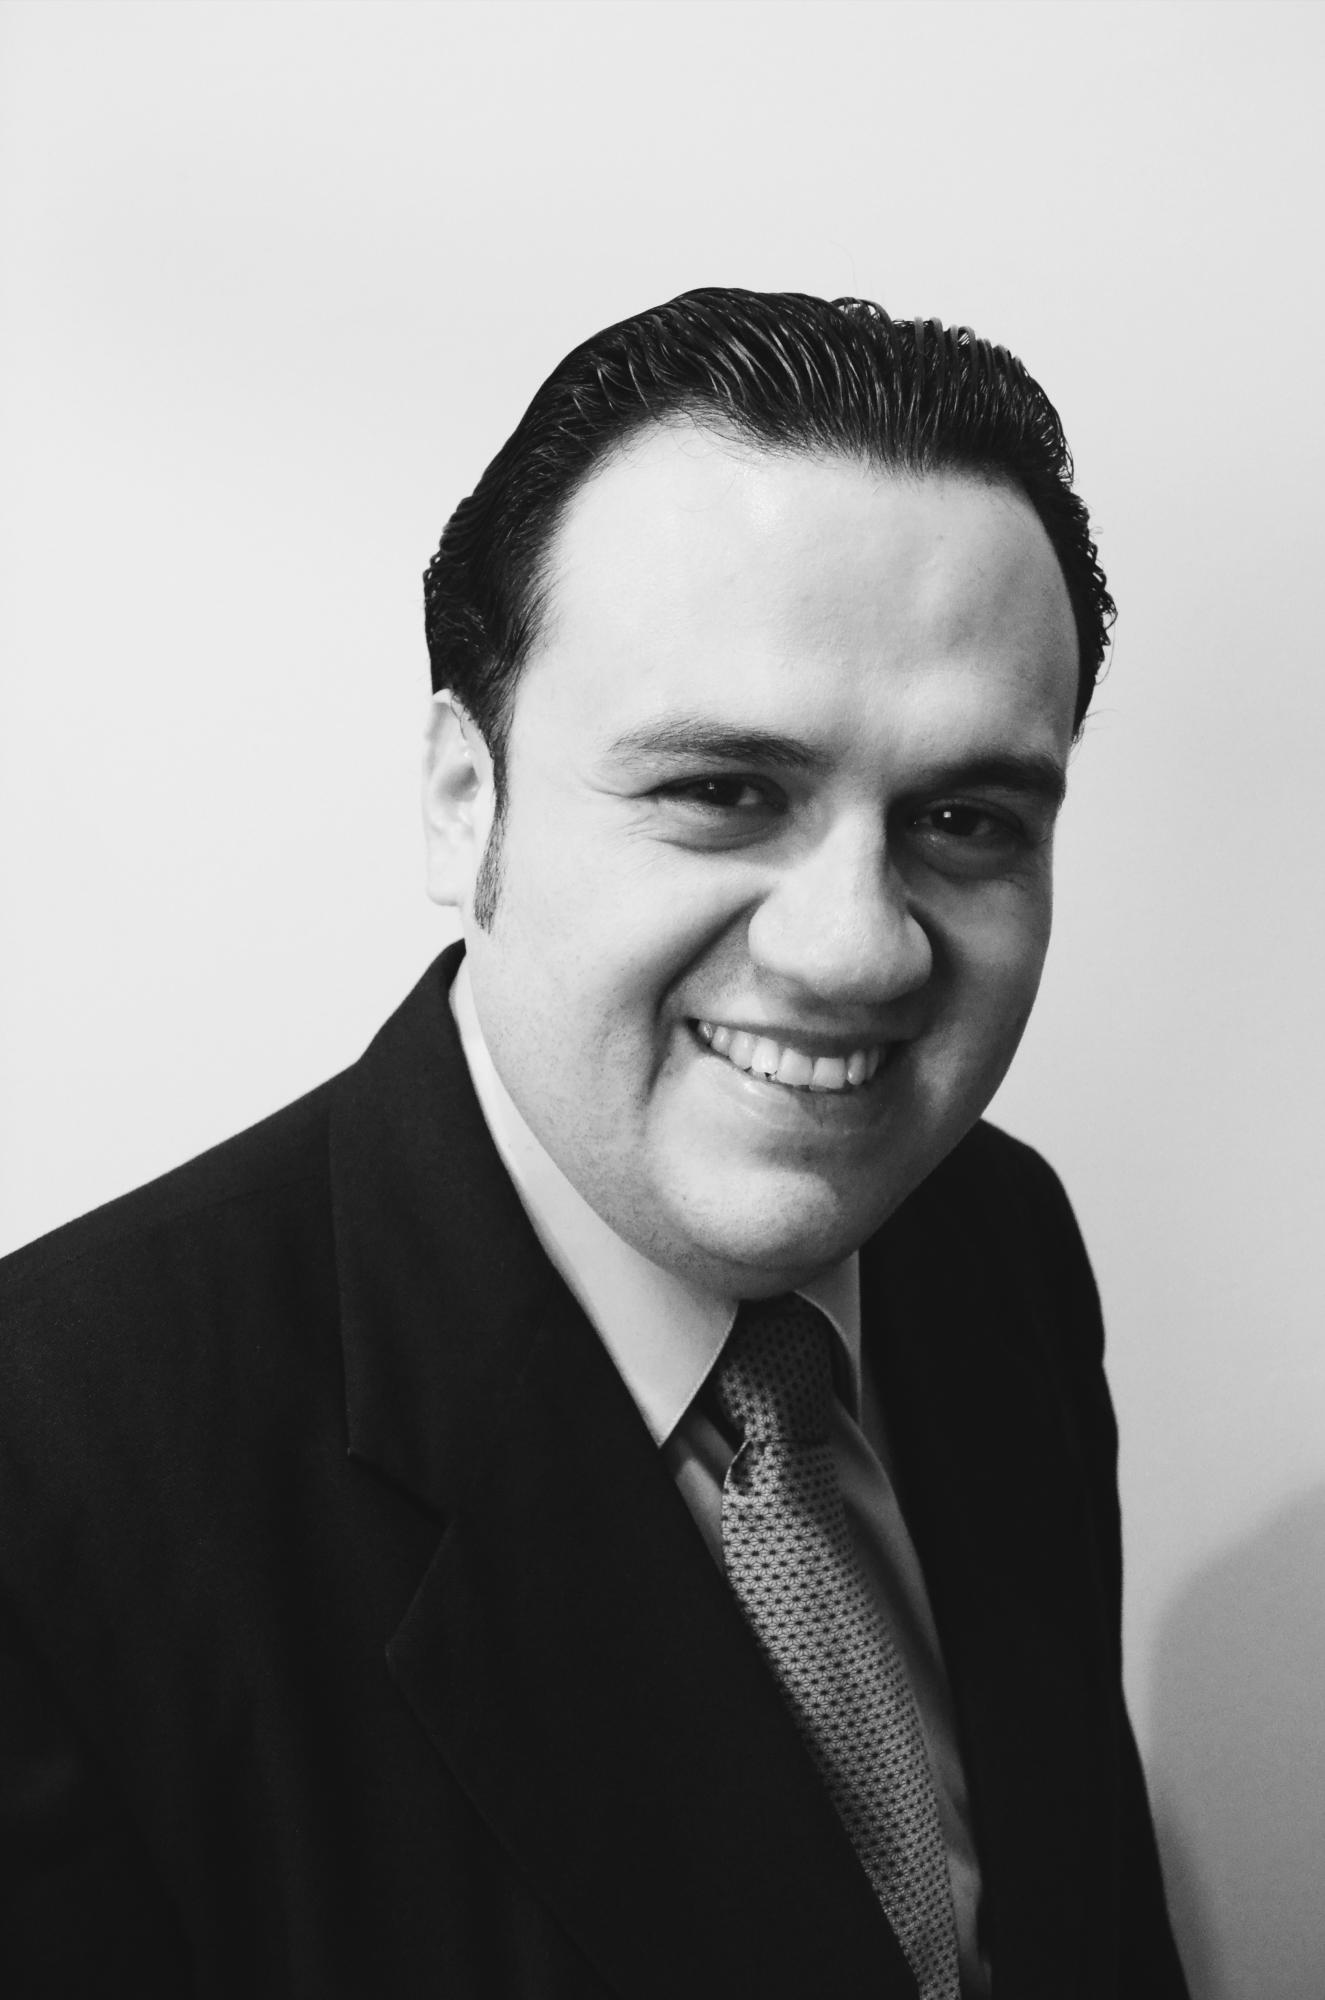 Sergio Banegas